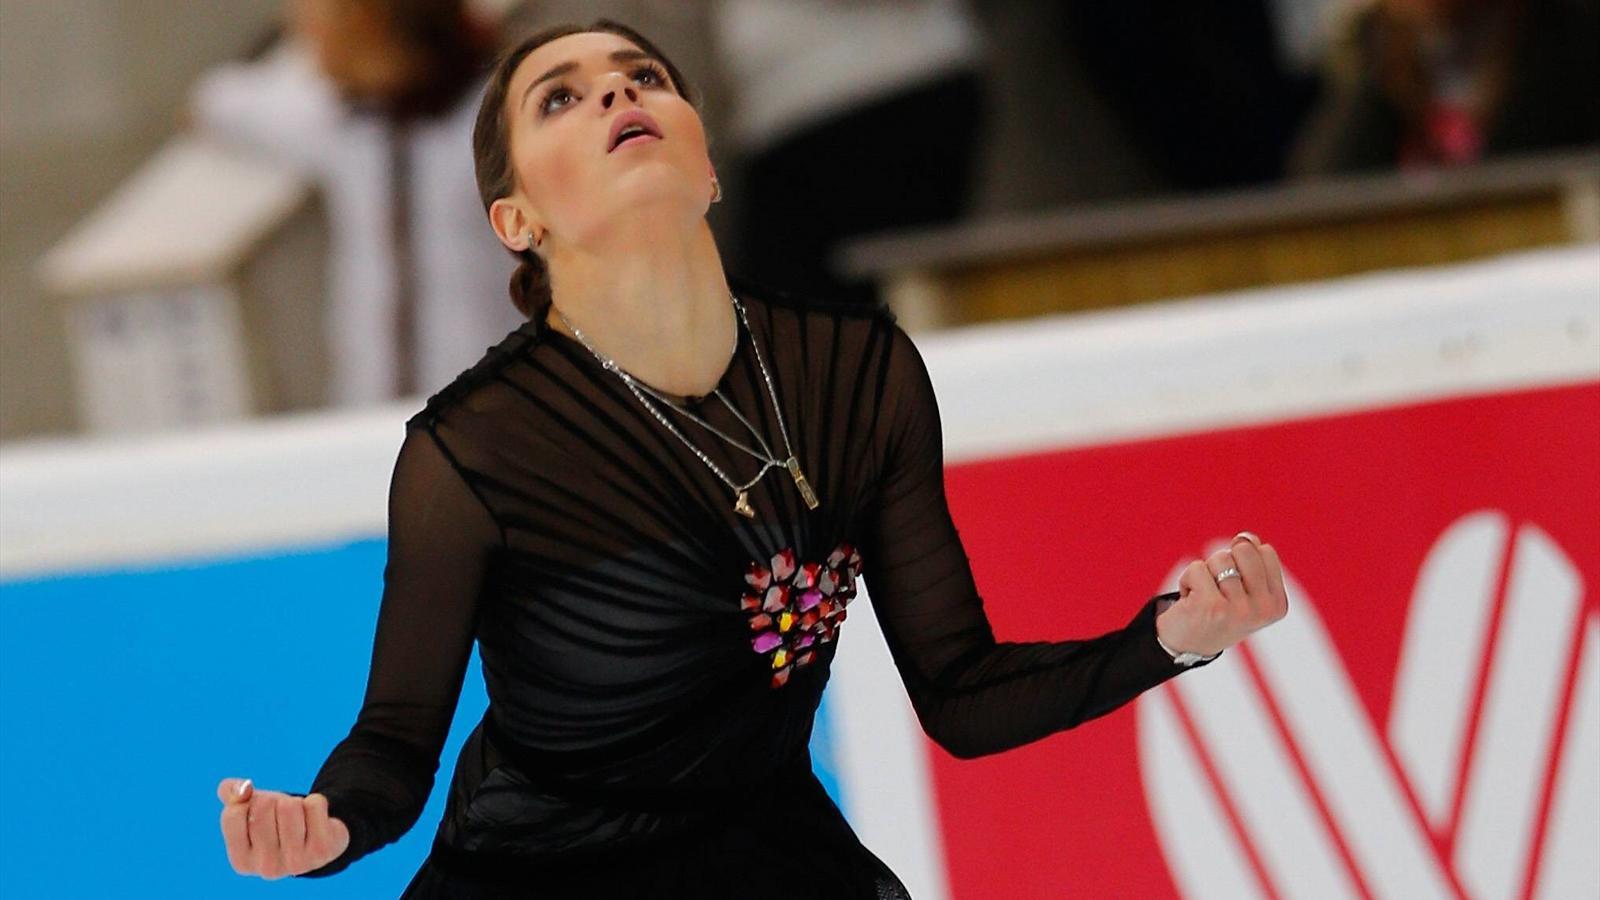 Фигуристка чемпионка олимпиады 2014